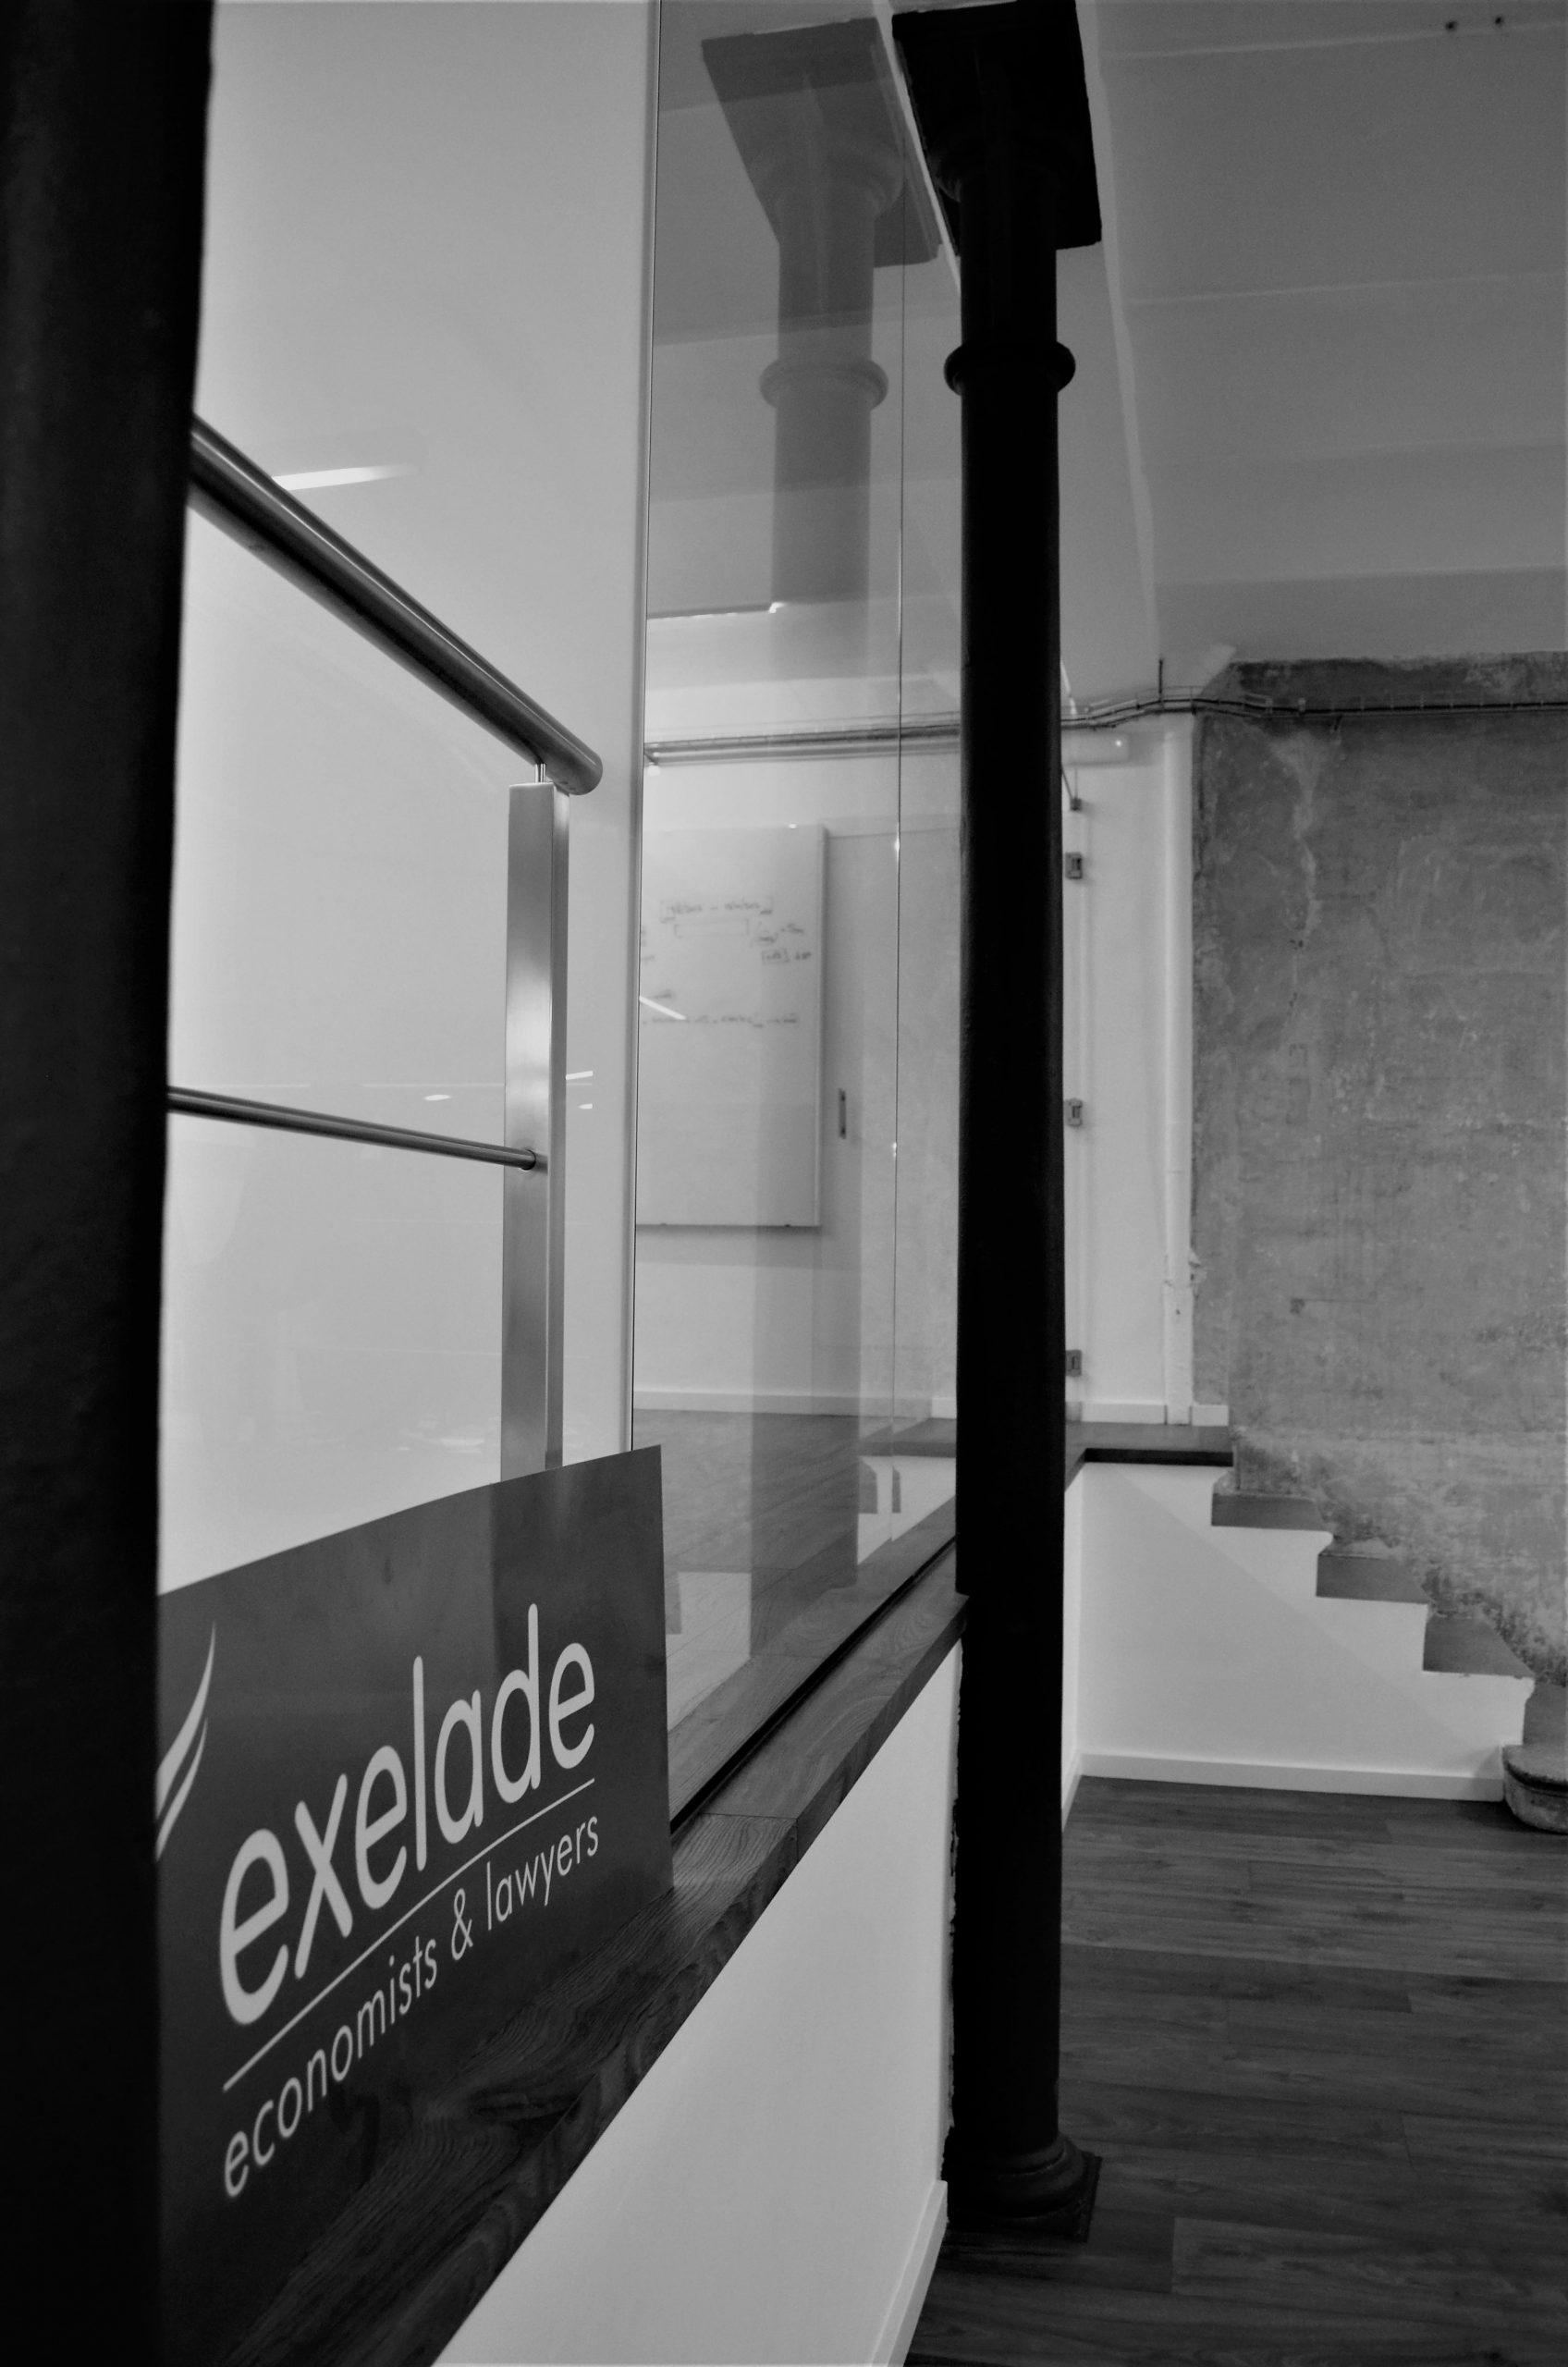 Oficinas Exelade